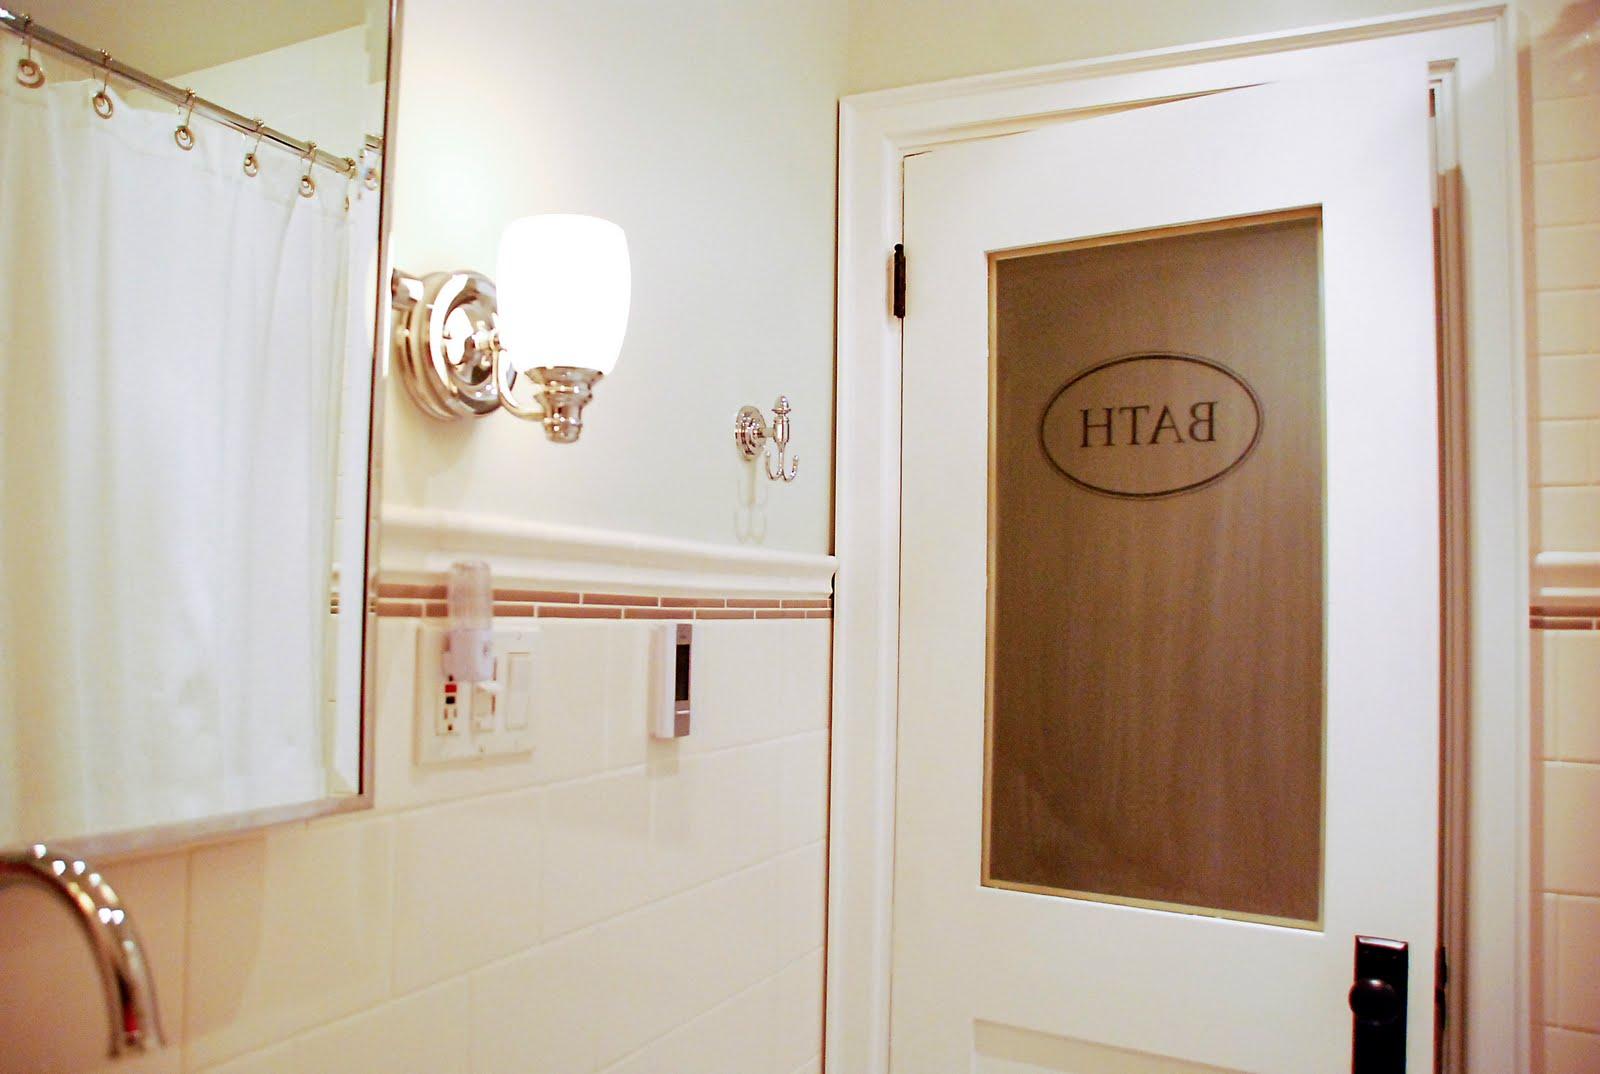 La salle de bain c 39 est fini rambling renovators - What does salle de bain mean in english ...